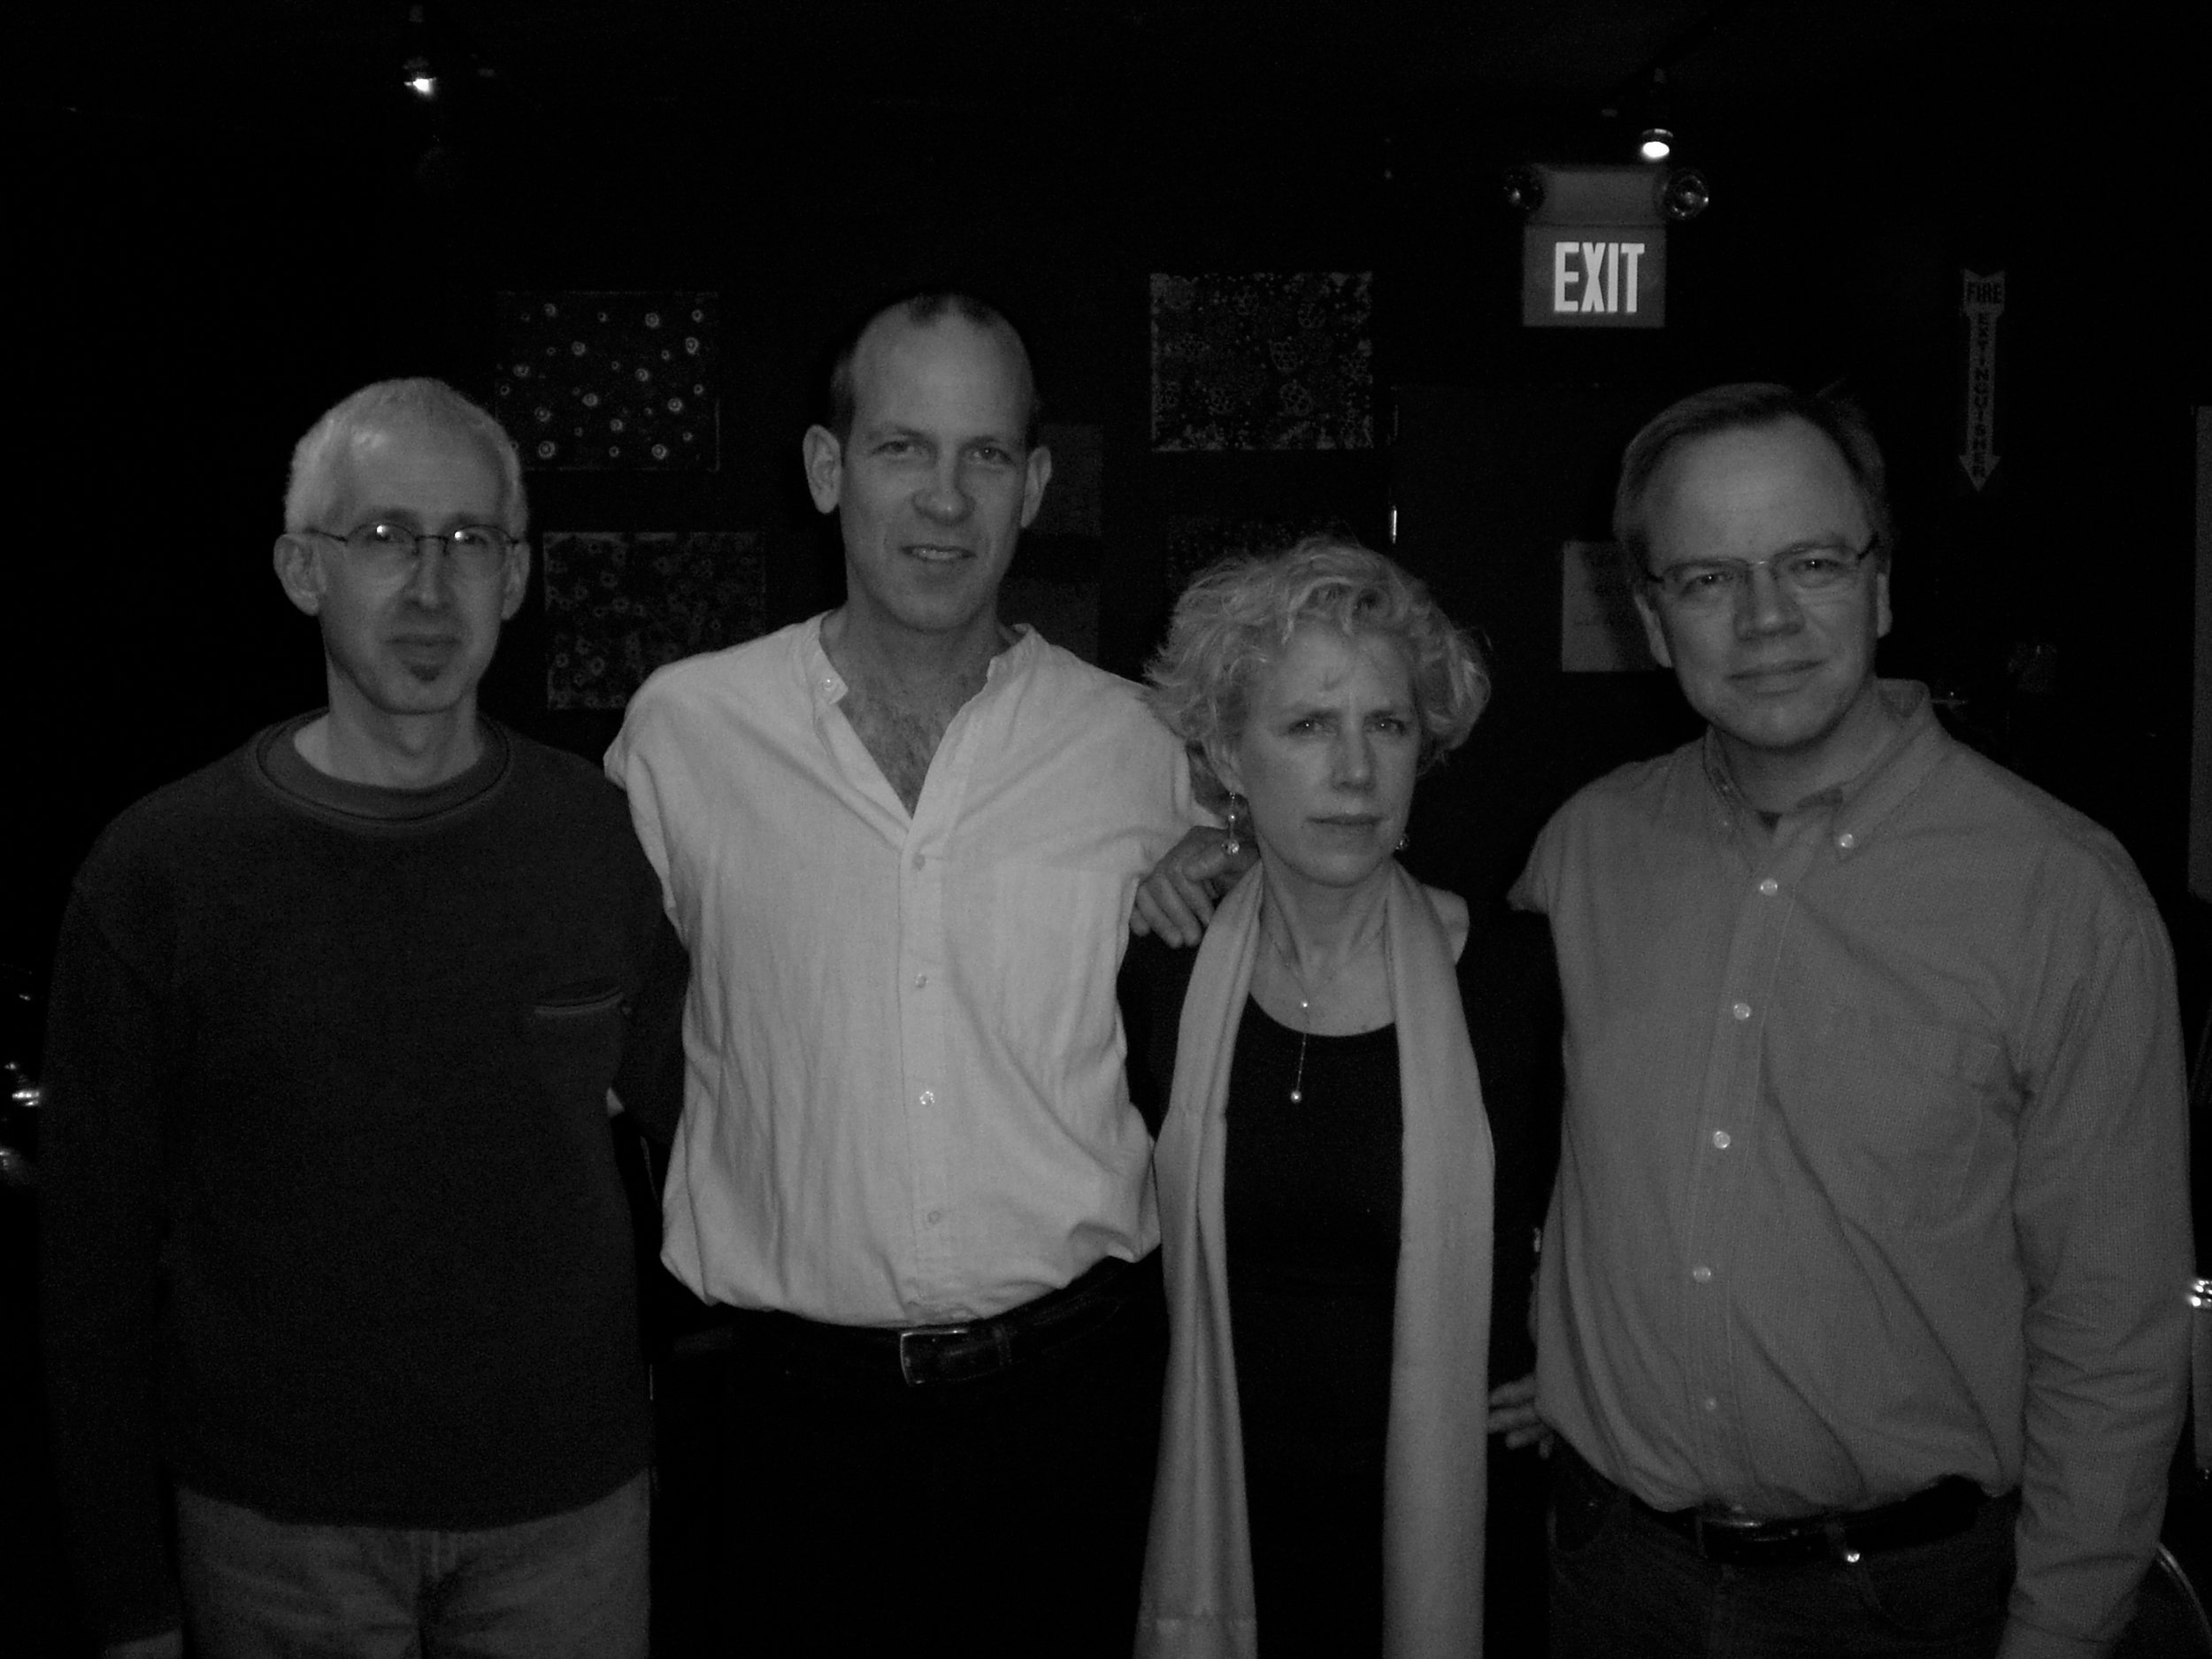 YNSQ • Joel Springer, Tom Hall, Cercie Miller, Allan Chase